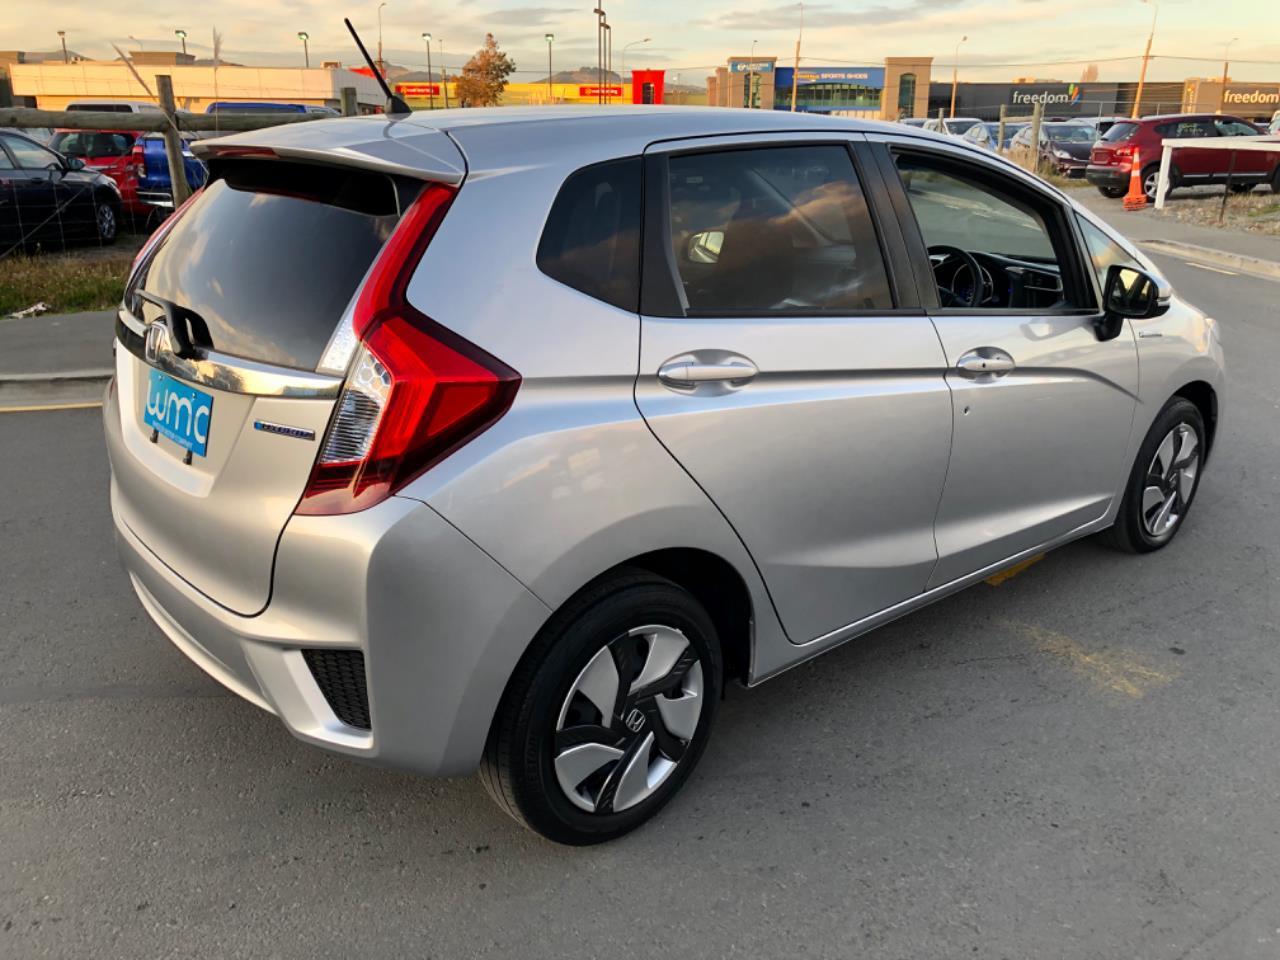 image-8, 2015 Honda Fit Hybrid F-Package at Christchurch